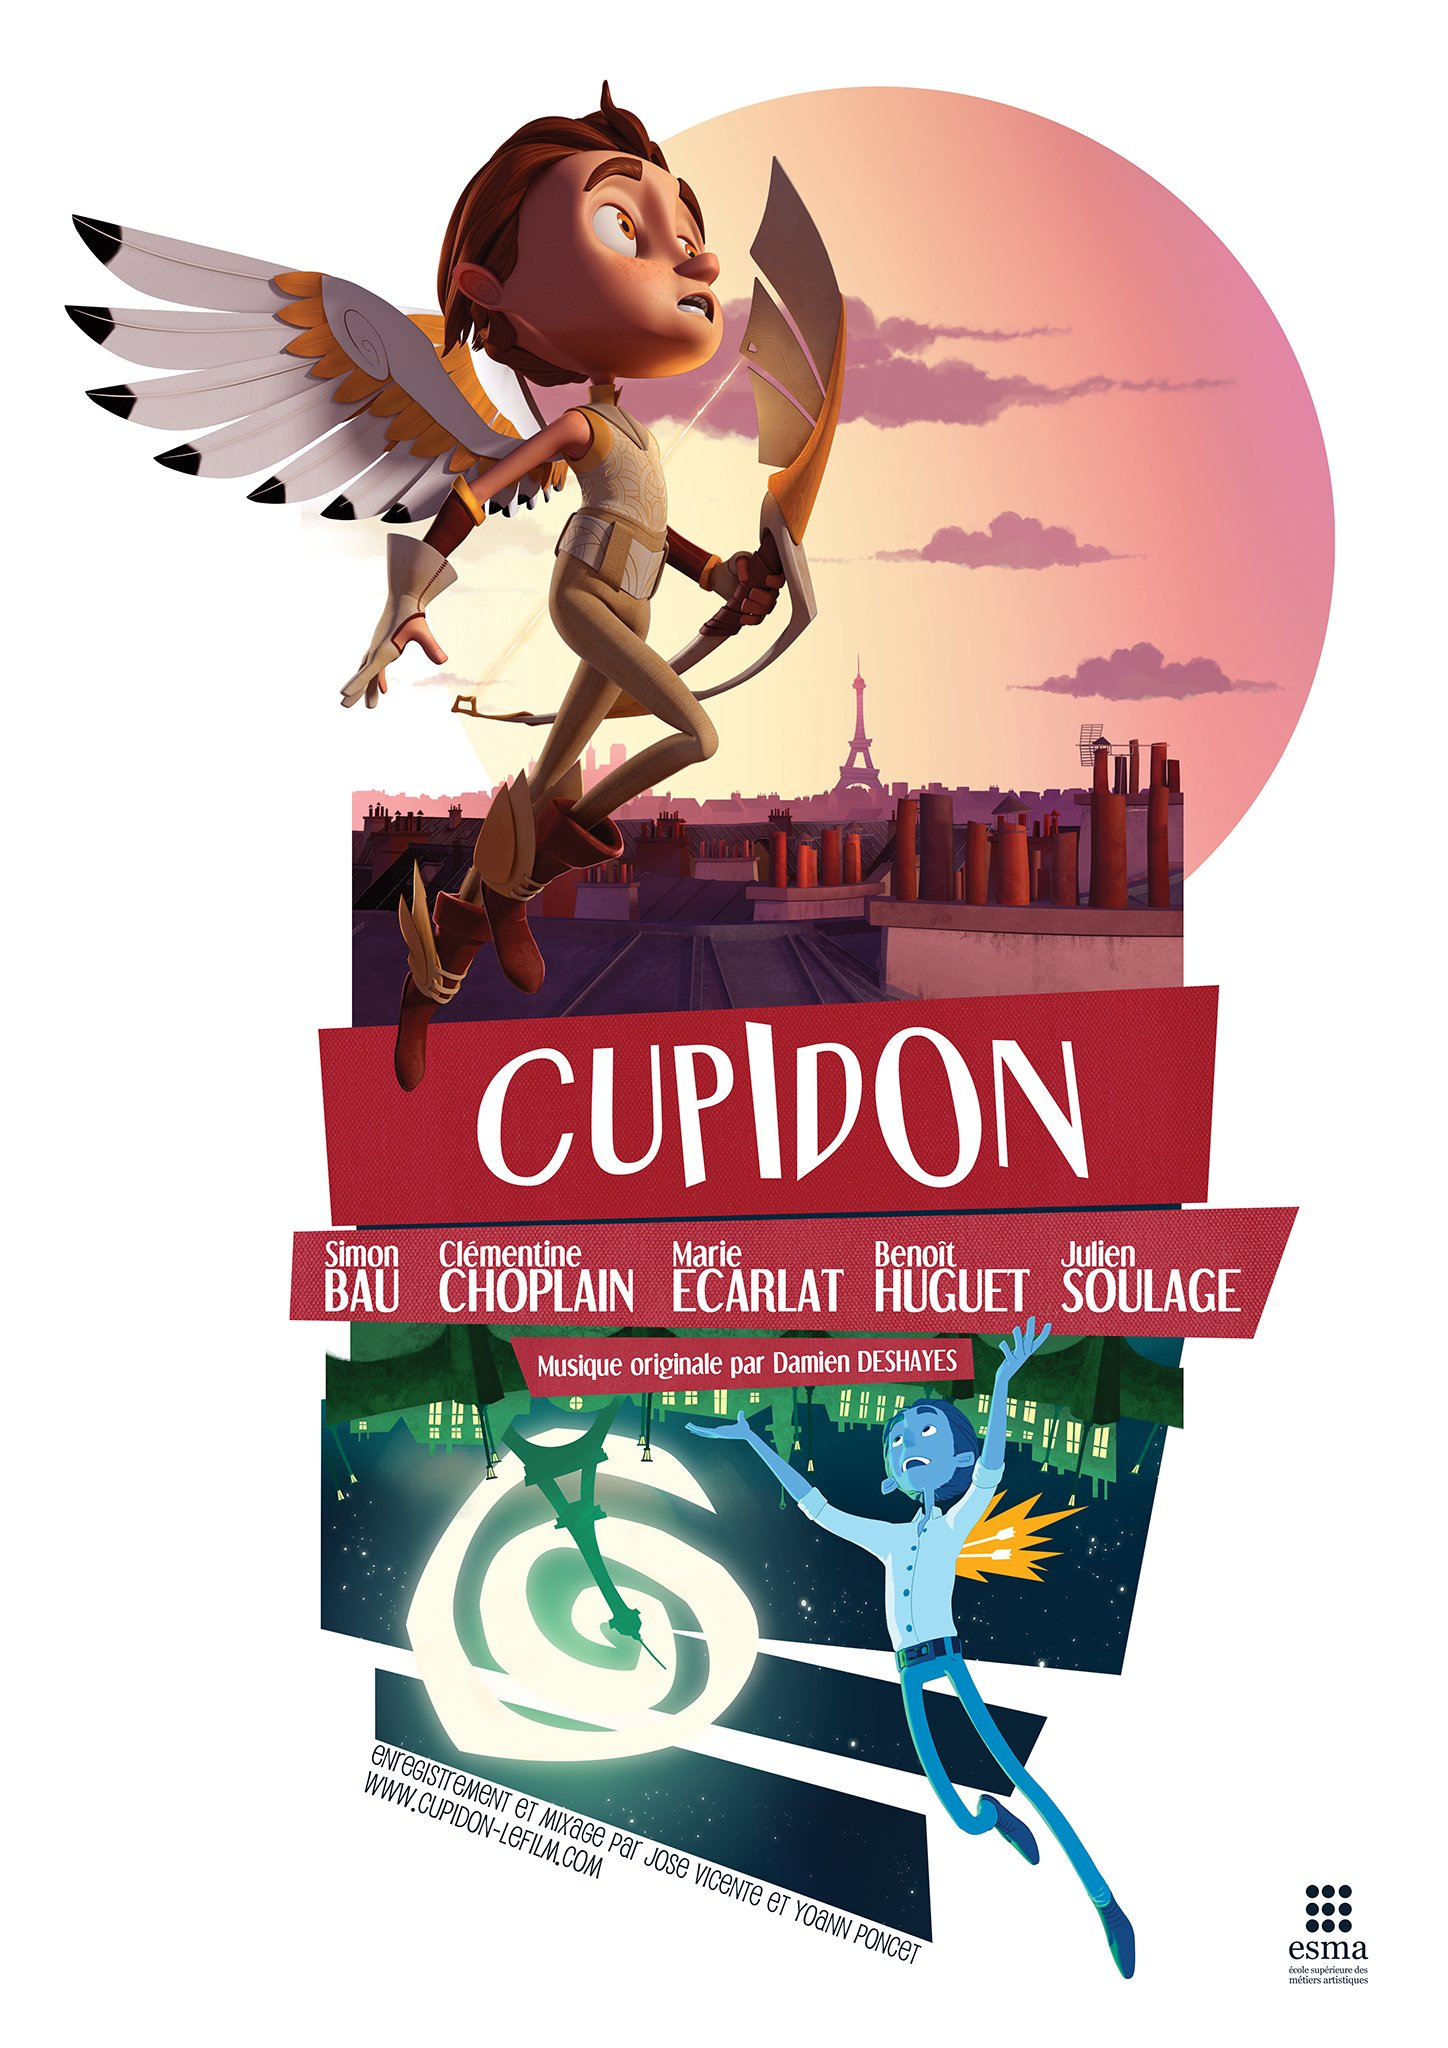 Artstation Cupidon Student Short Film 2012 Simon Bau